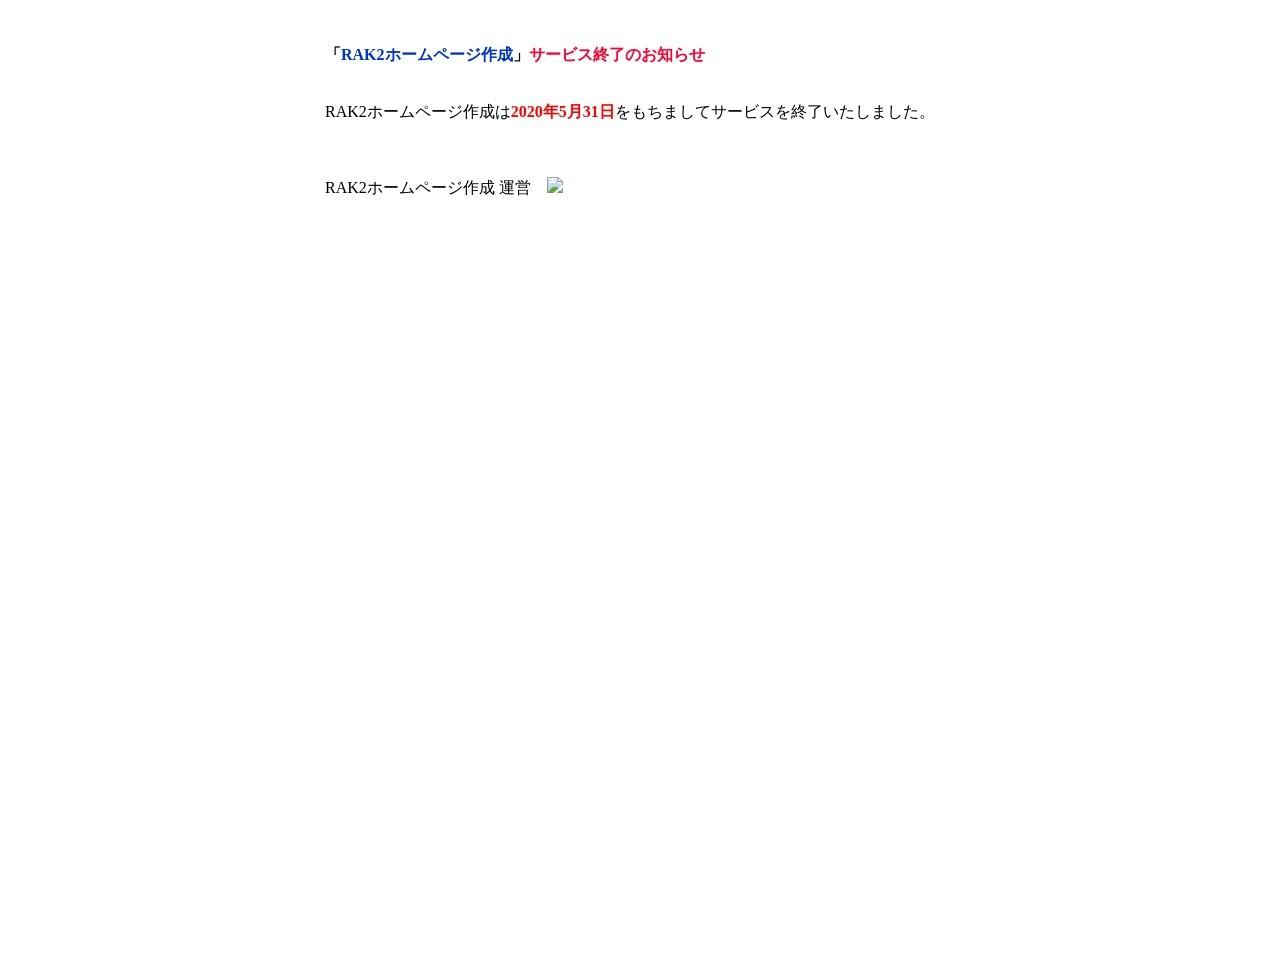 RAK2ホームページ作成 第2サーバー